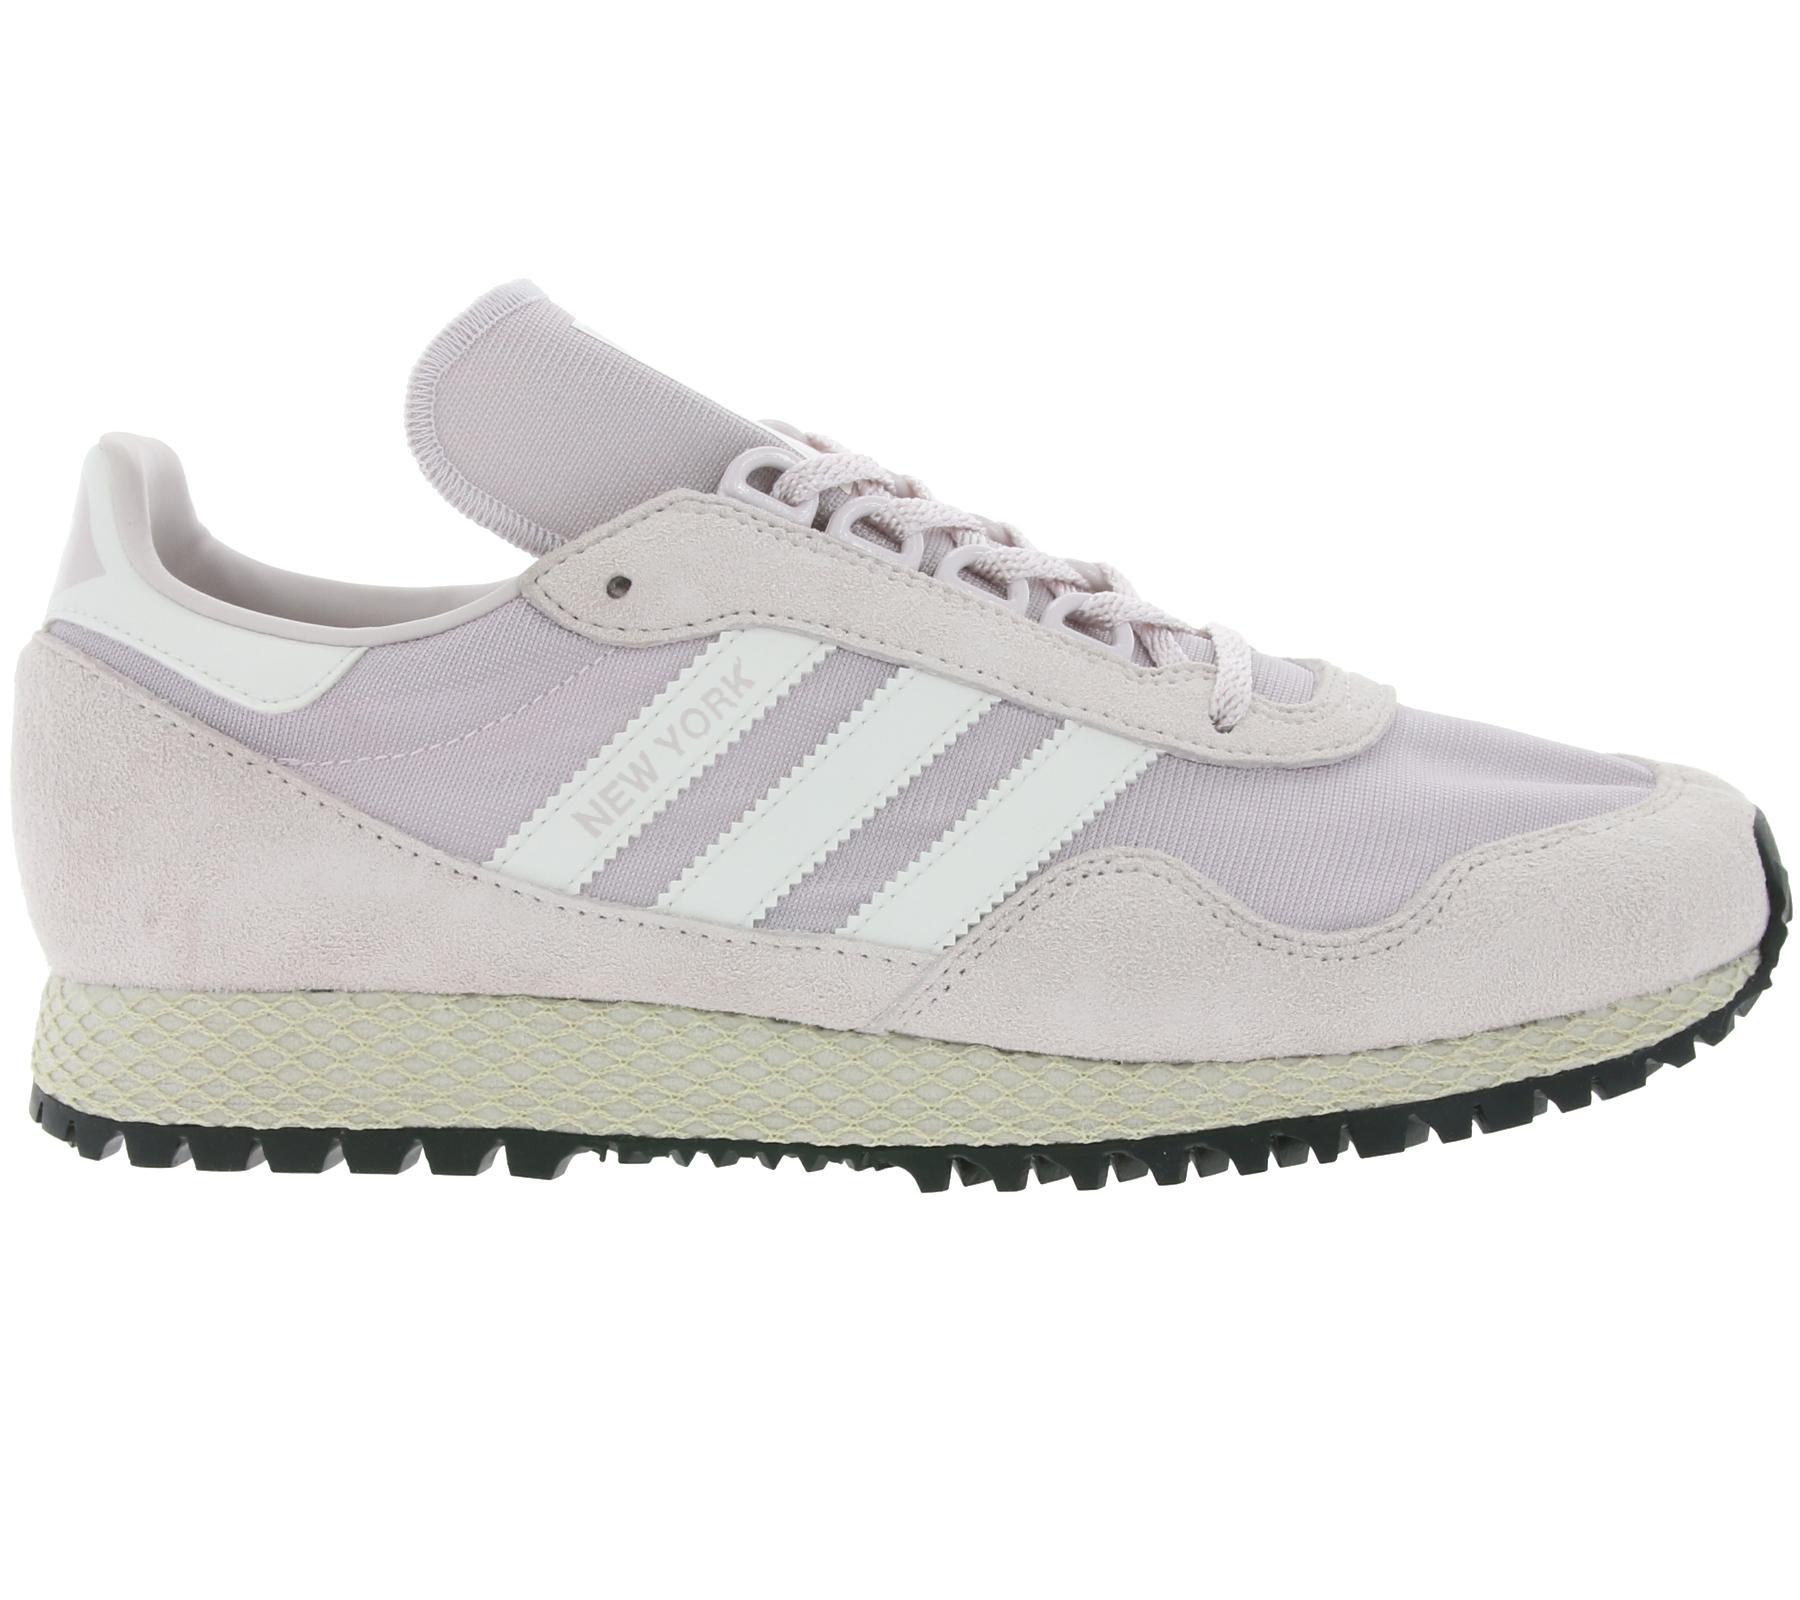 Großer adidas Originals SALE @outlet46 #vieleCLASSICSdabei